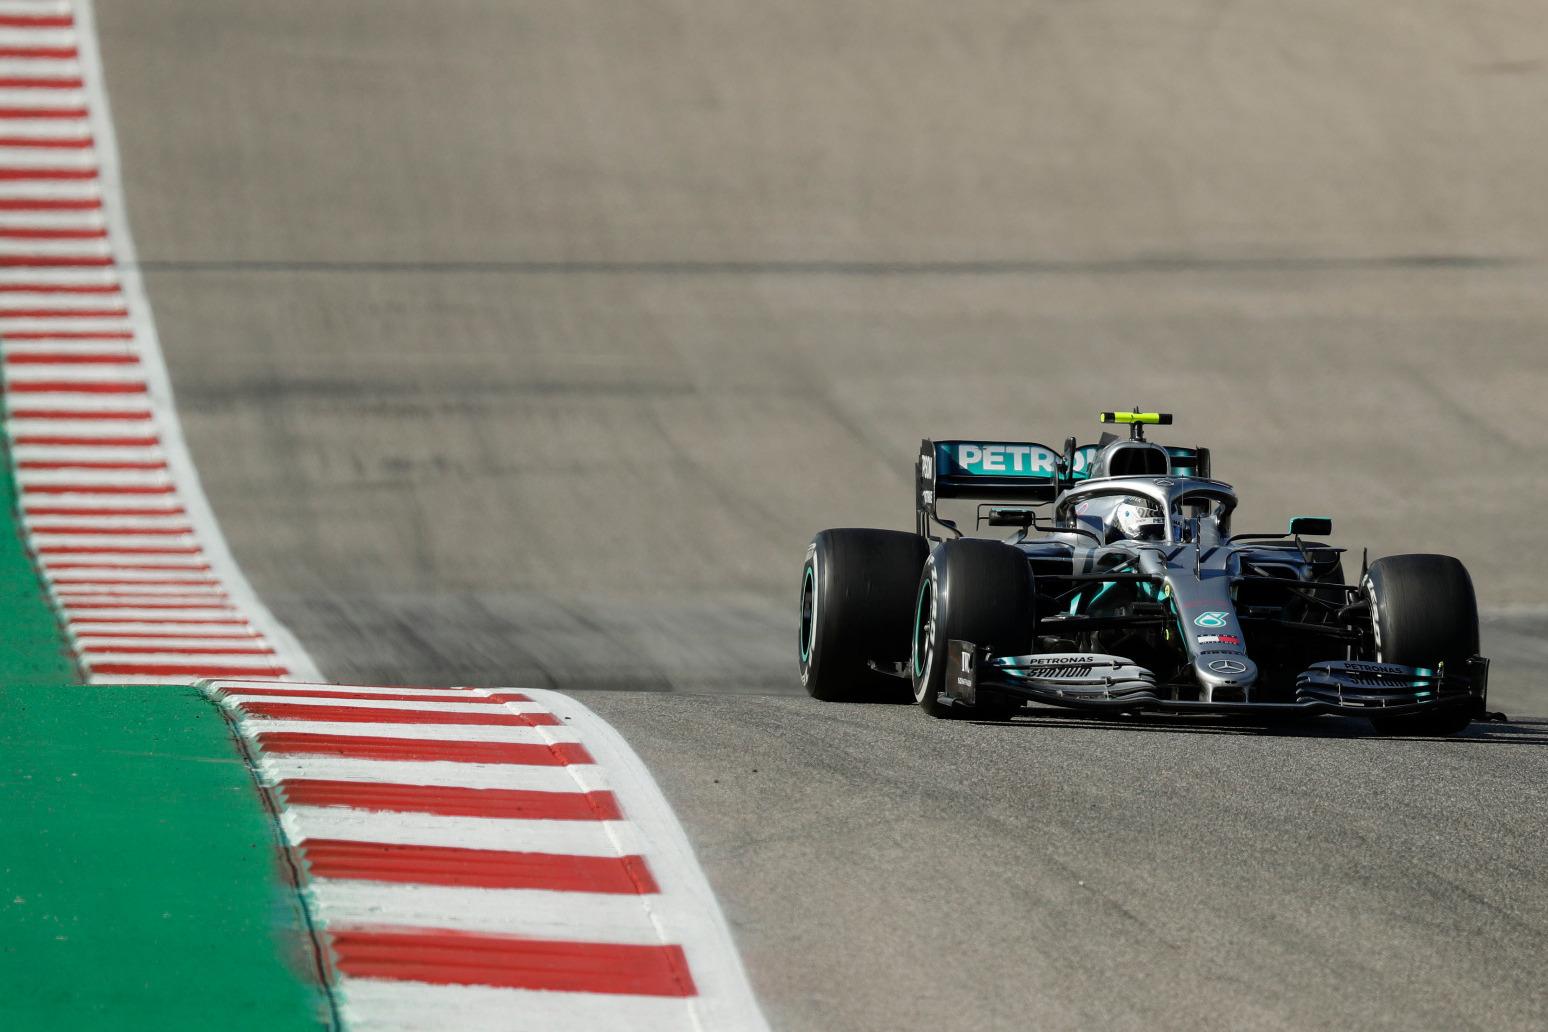 Bottas wins but Hamilton takes 6th F1 World Championship title